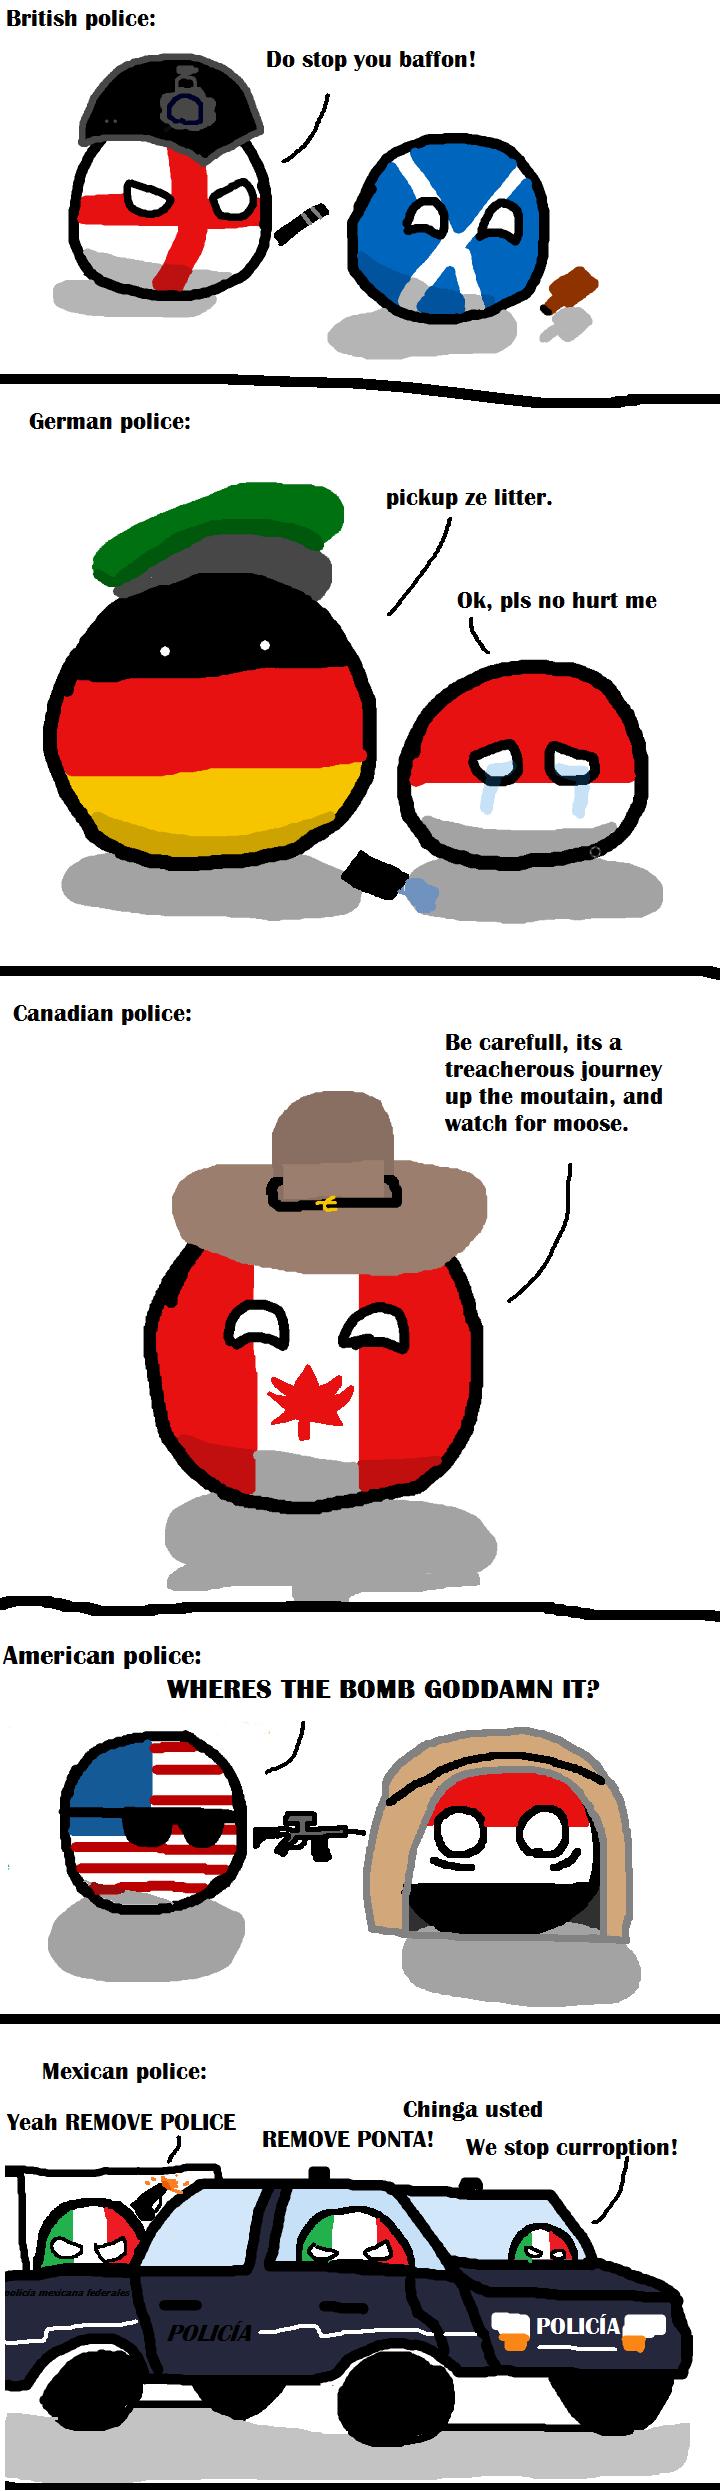 Polandball Comics Police+Around+the+World.+r+polandball+bandaidplus+I+guess+America+would+make_f4c7d4_4908345